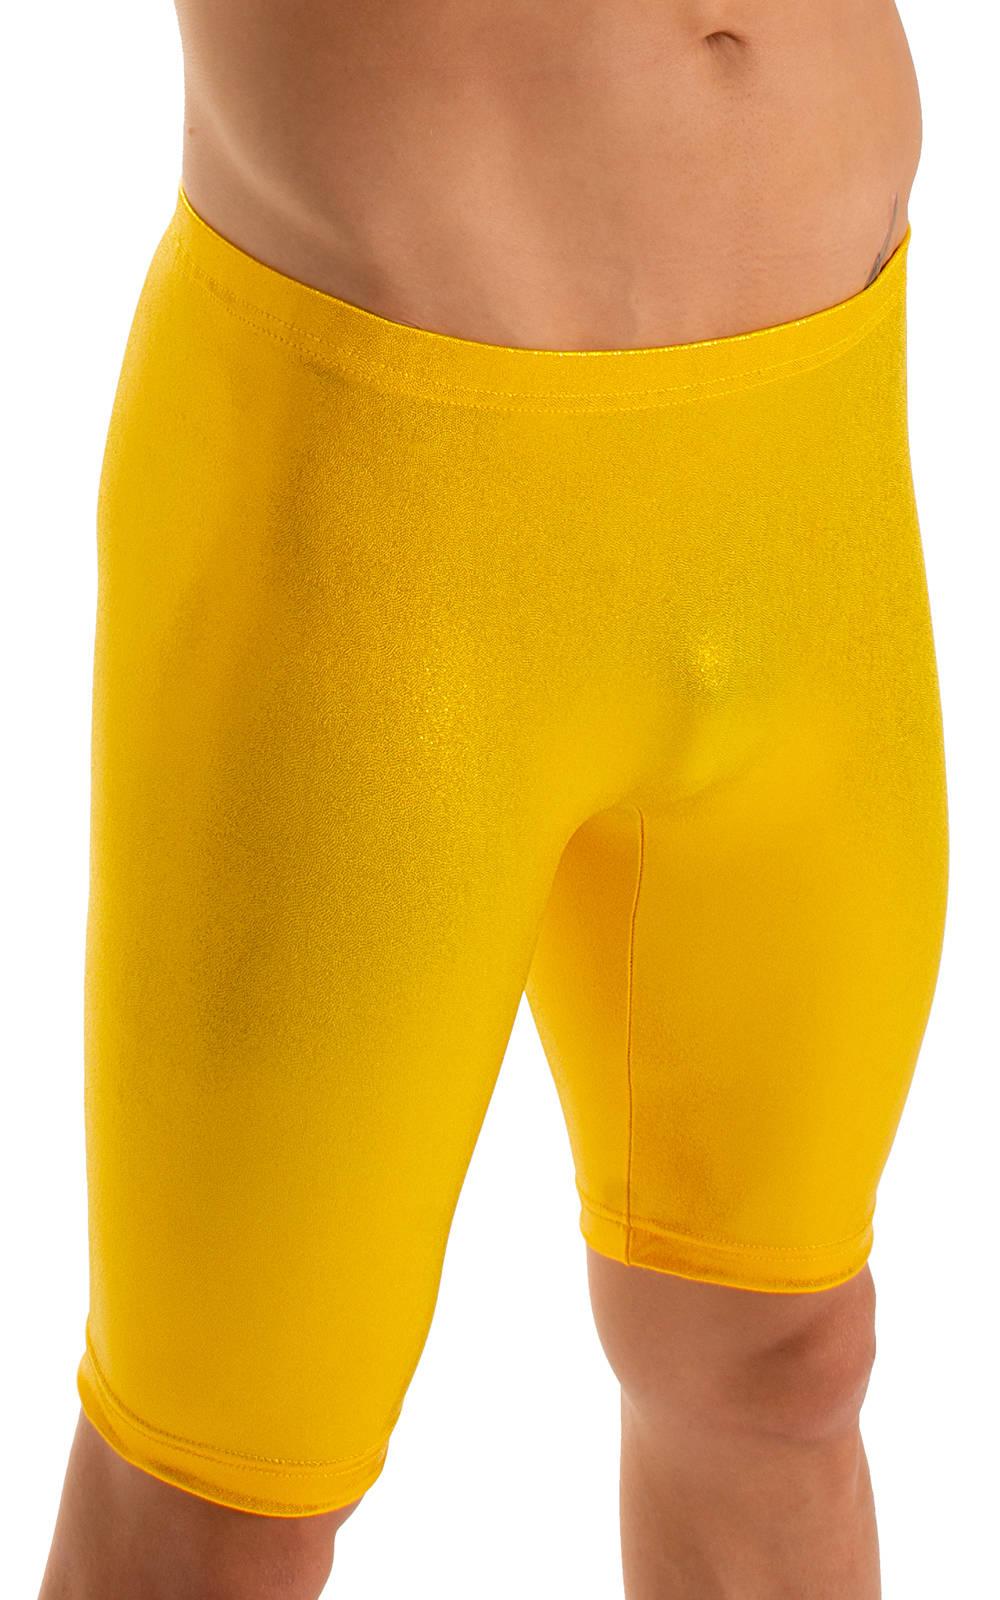 Lycra Bike Length Shorts in Metallic Mystique Chartreuse 3